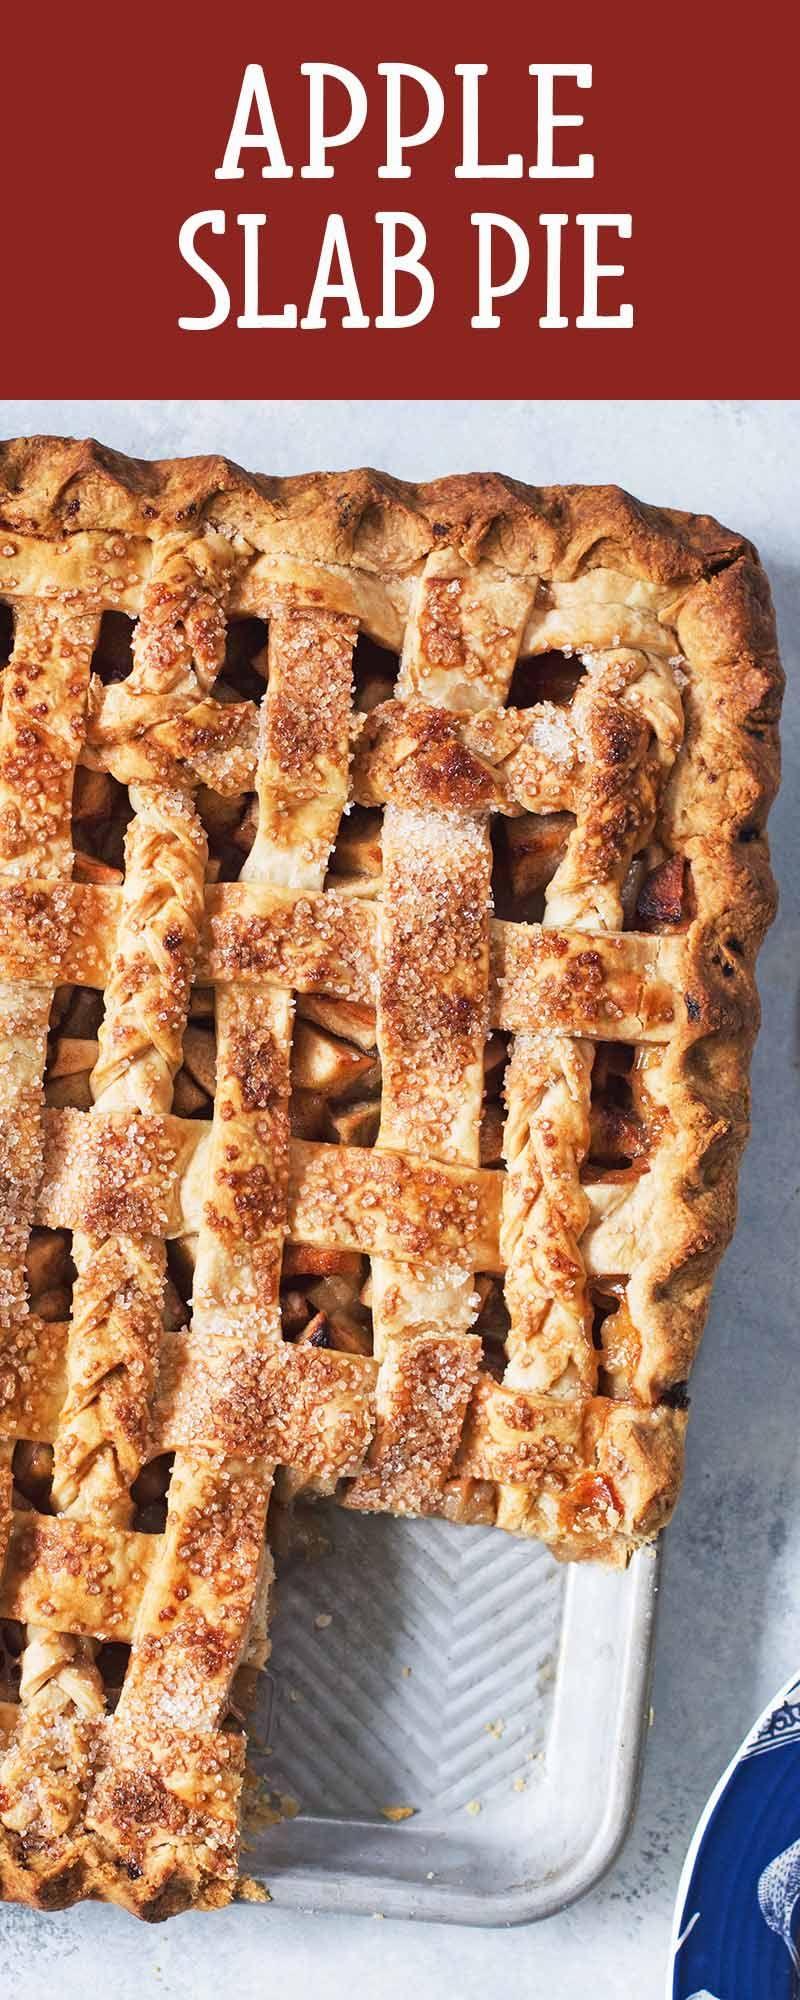 Apple slab pie recipe desserts for a crowd apple slab